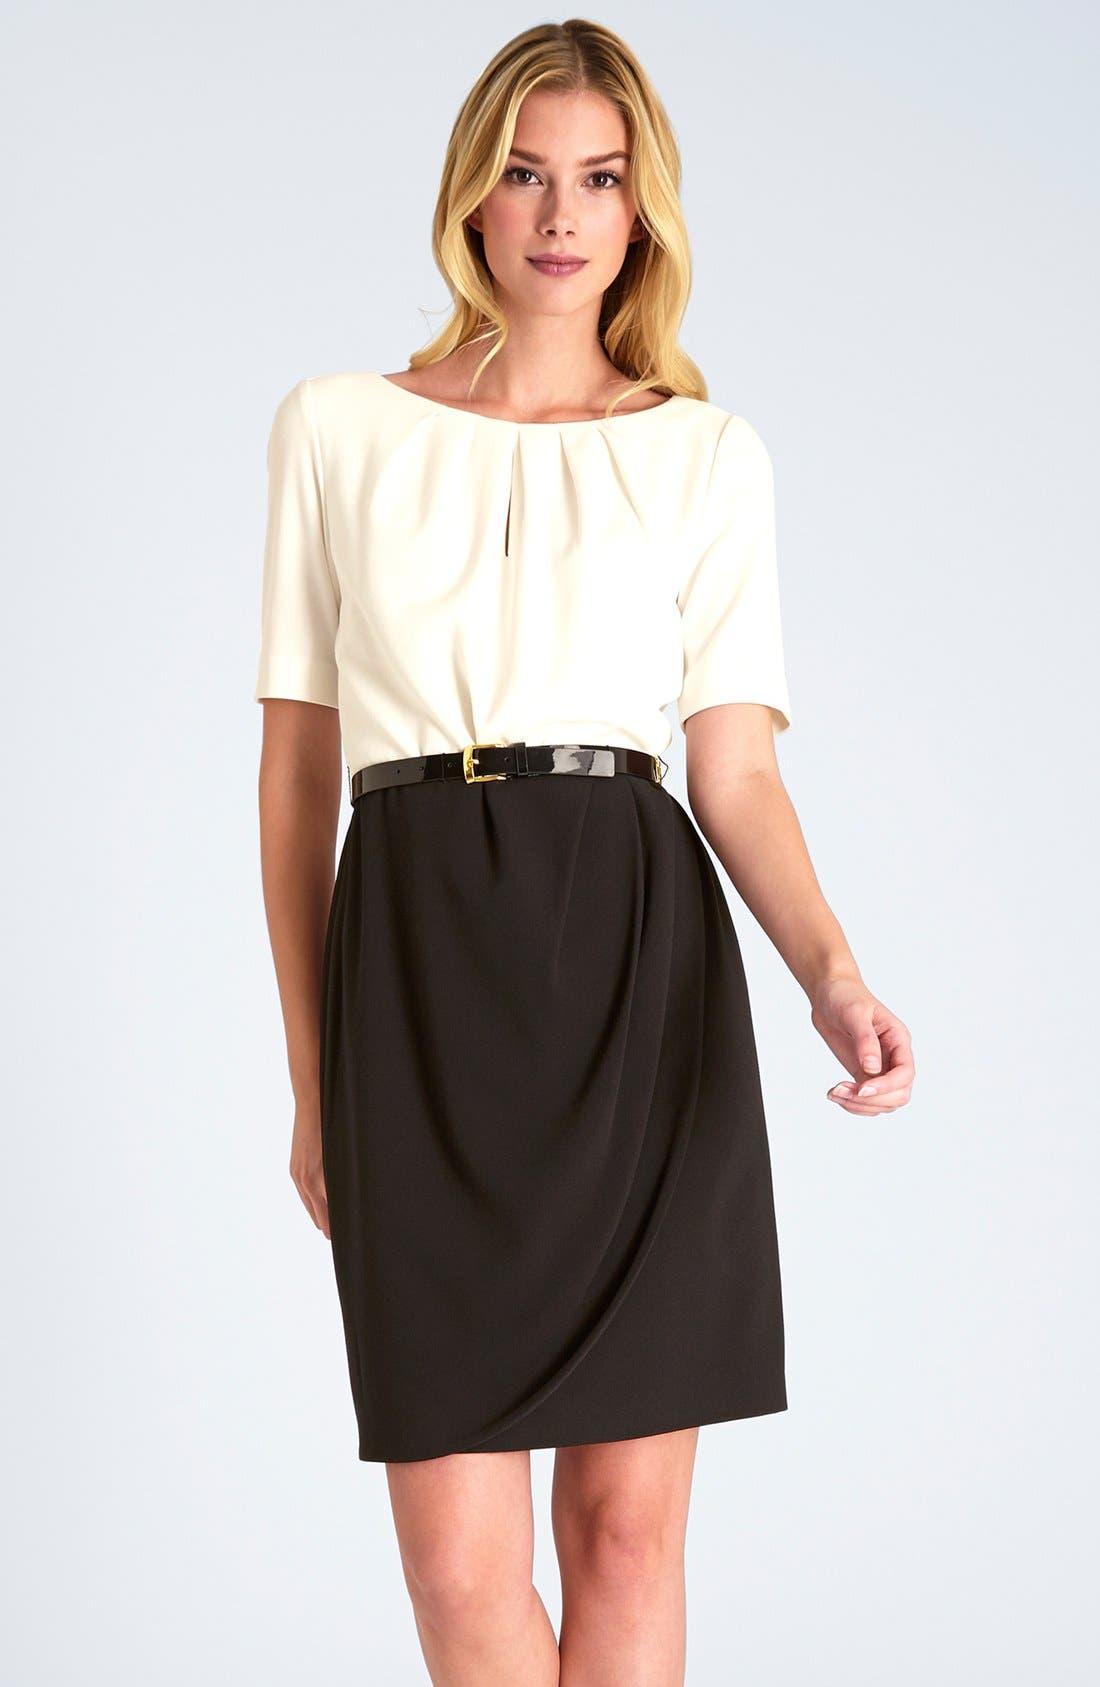 Alternate Image 1 Selected - Tahari Colorblock Stretch Crepe Sheath Dress